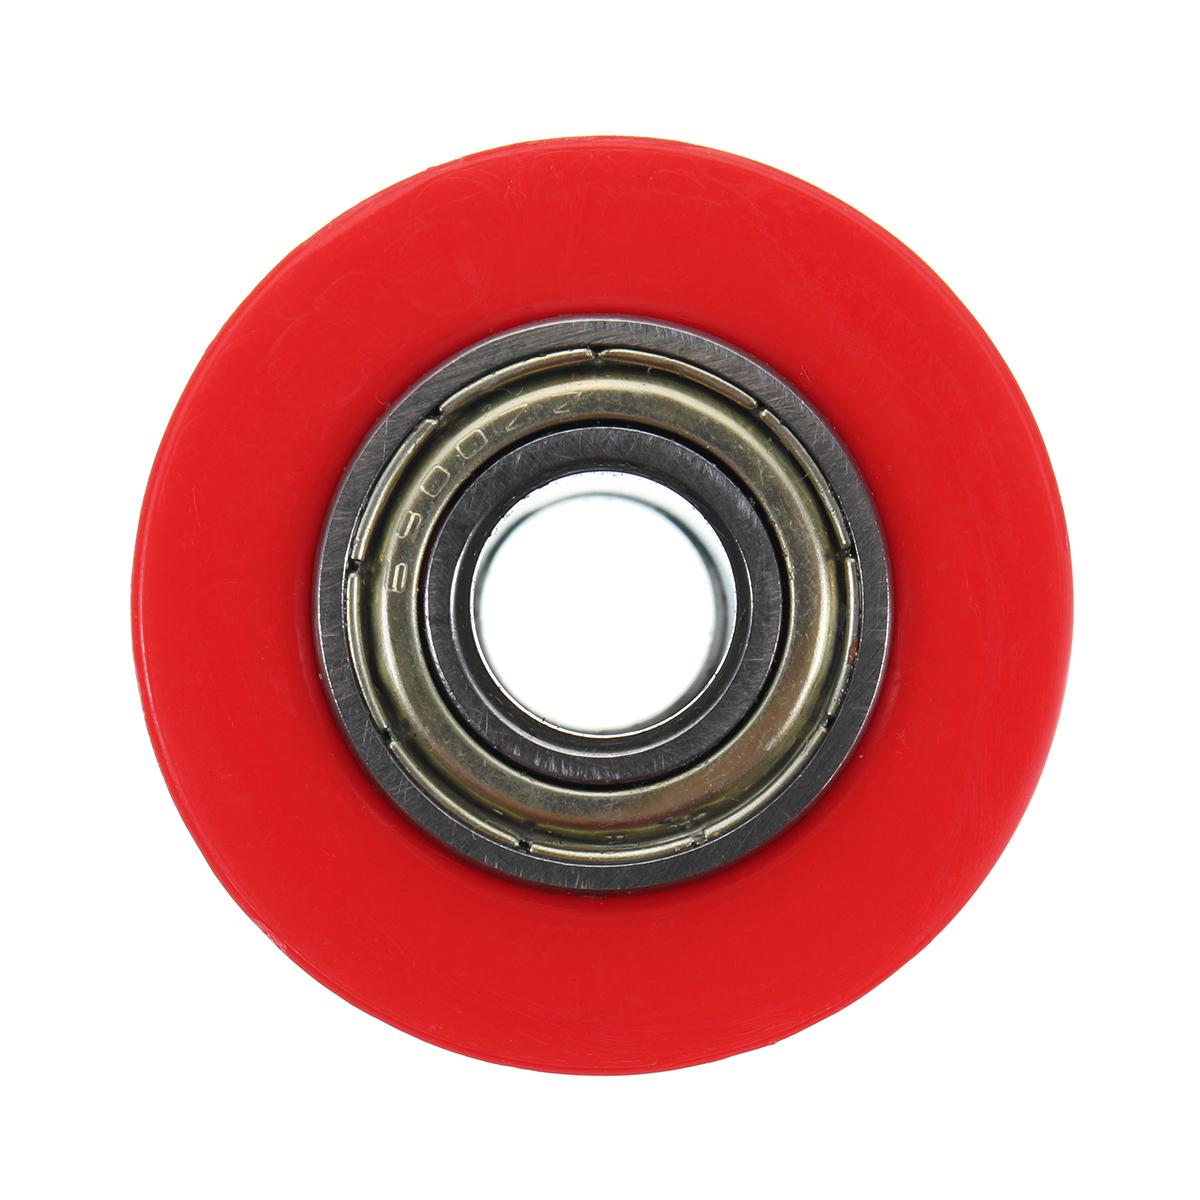 10mm Chain Roller Slider Tensioner Wheel Guide For Pit Dirt Mini Bike Motorcycle Black/Red/White